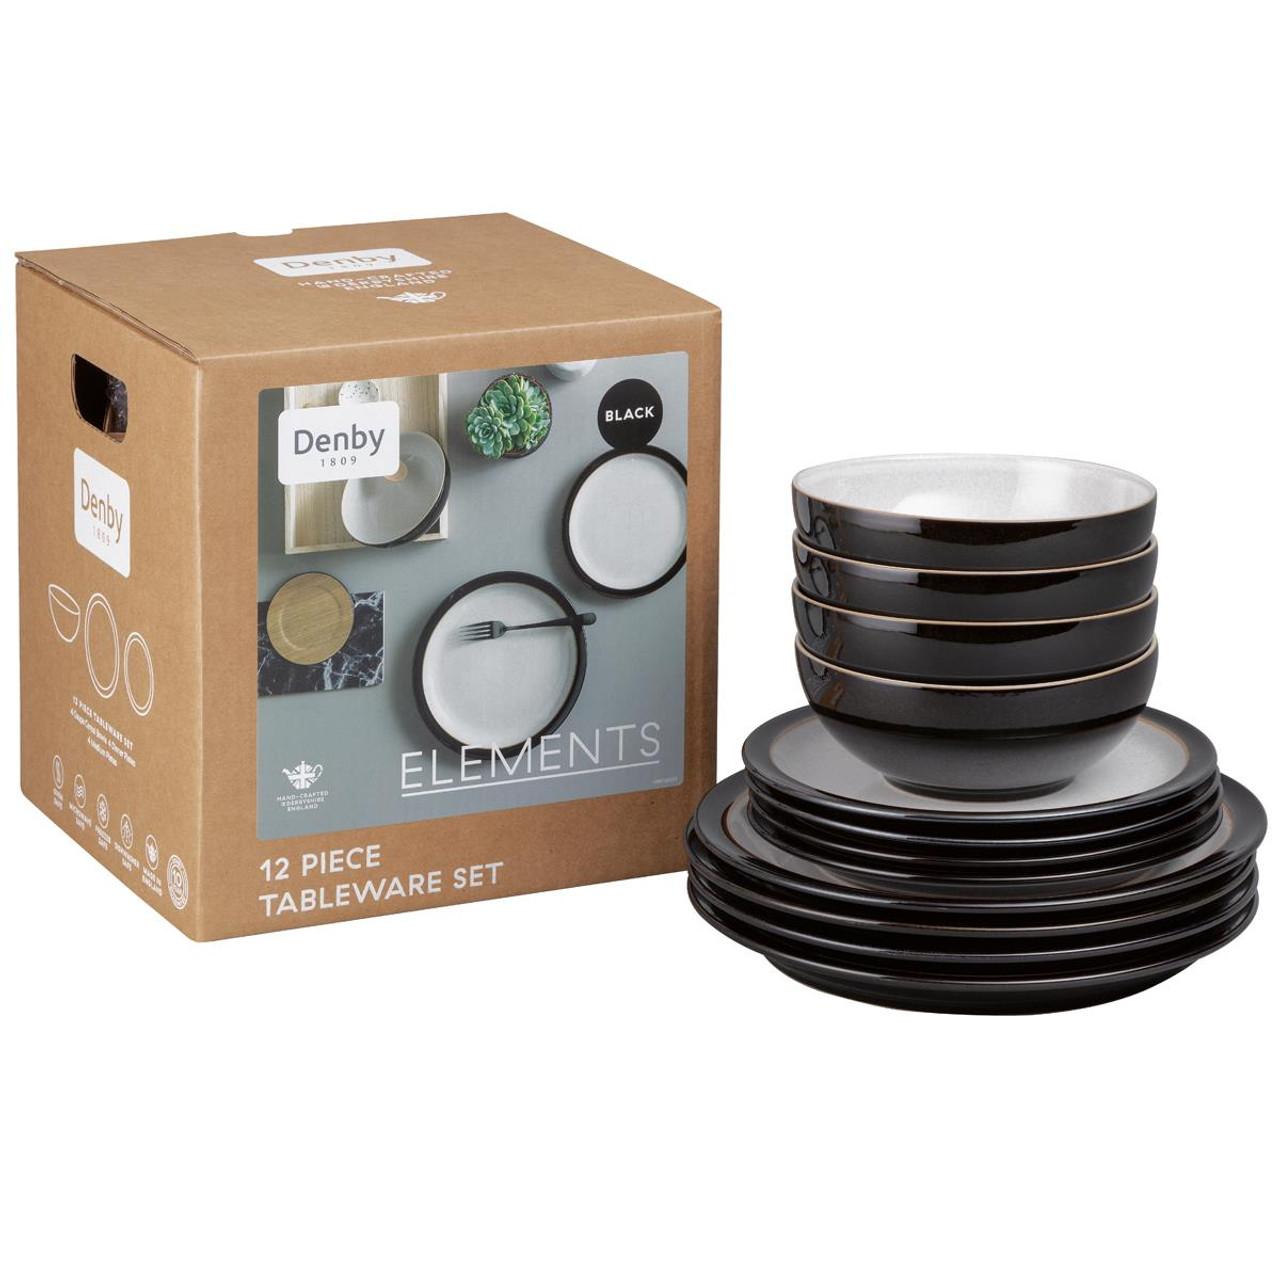 Denby Elements Black 12 Piece Tableware Set